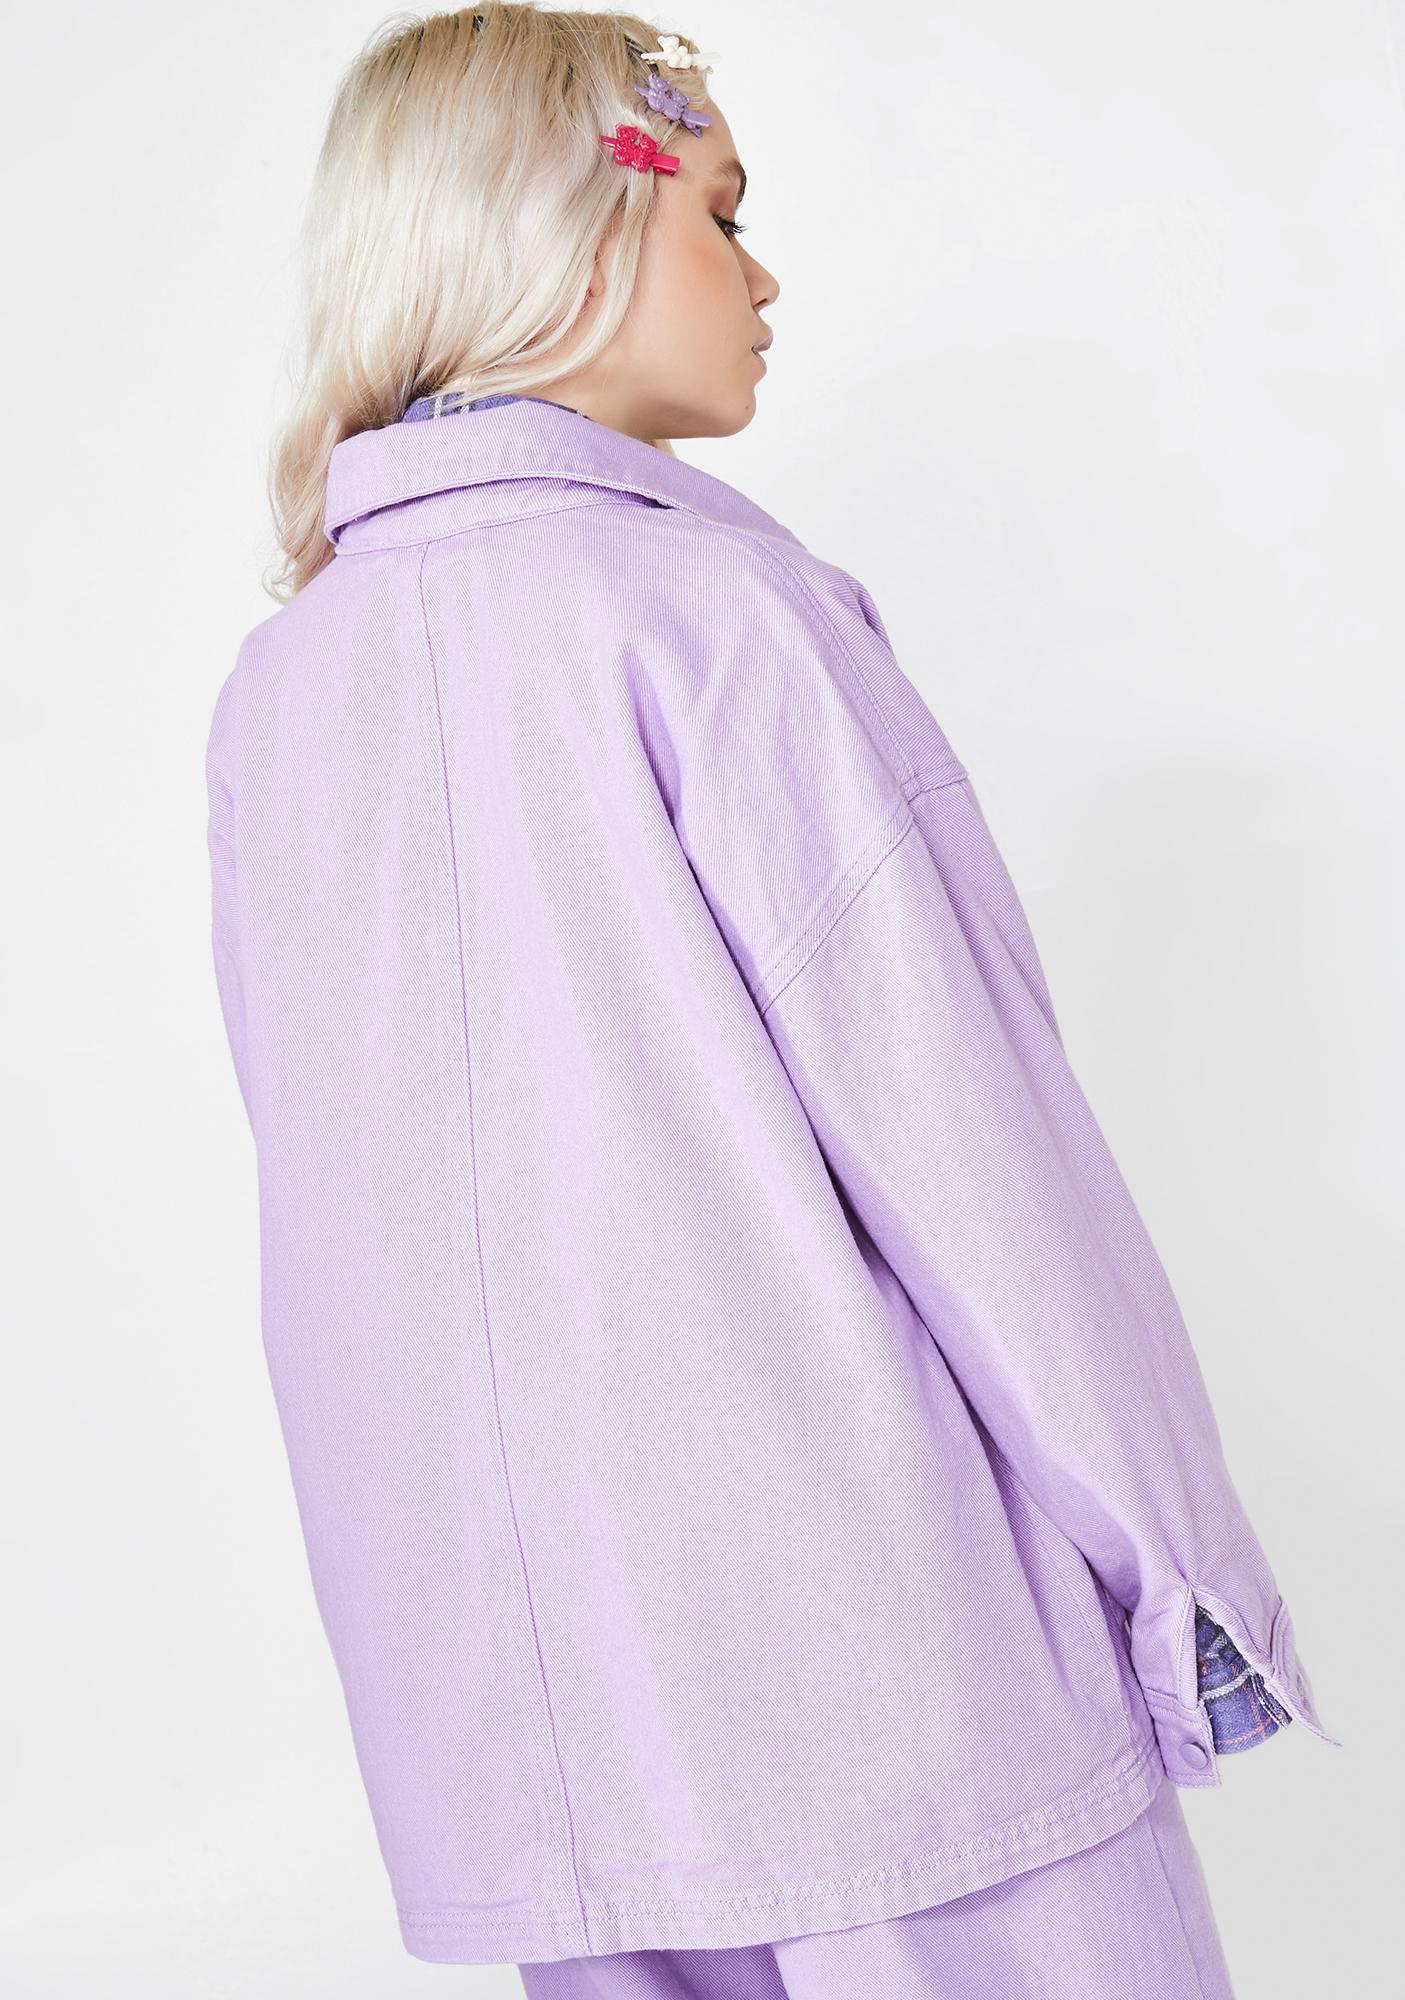 Lazy Oaf LO Lilac Chore Jacket